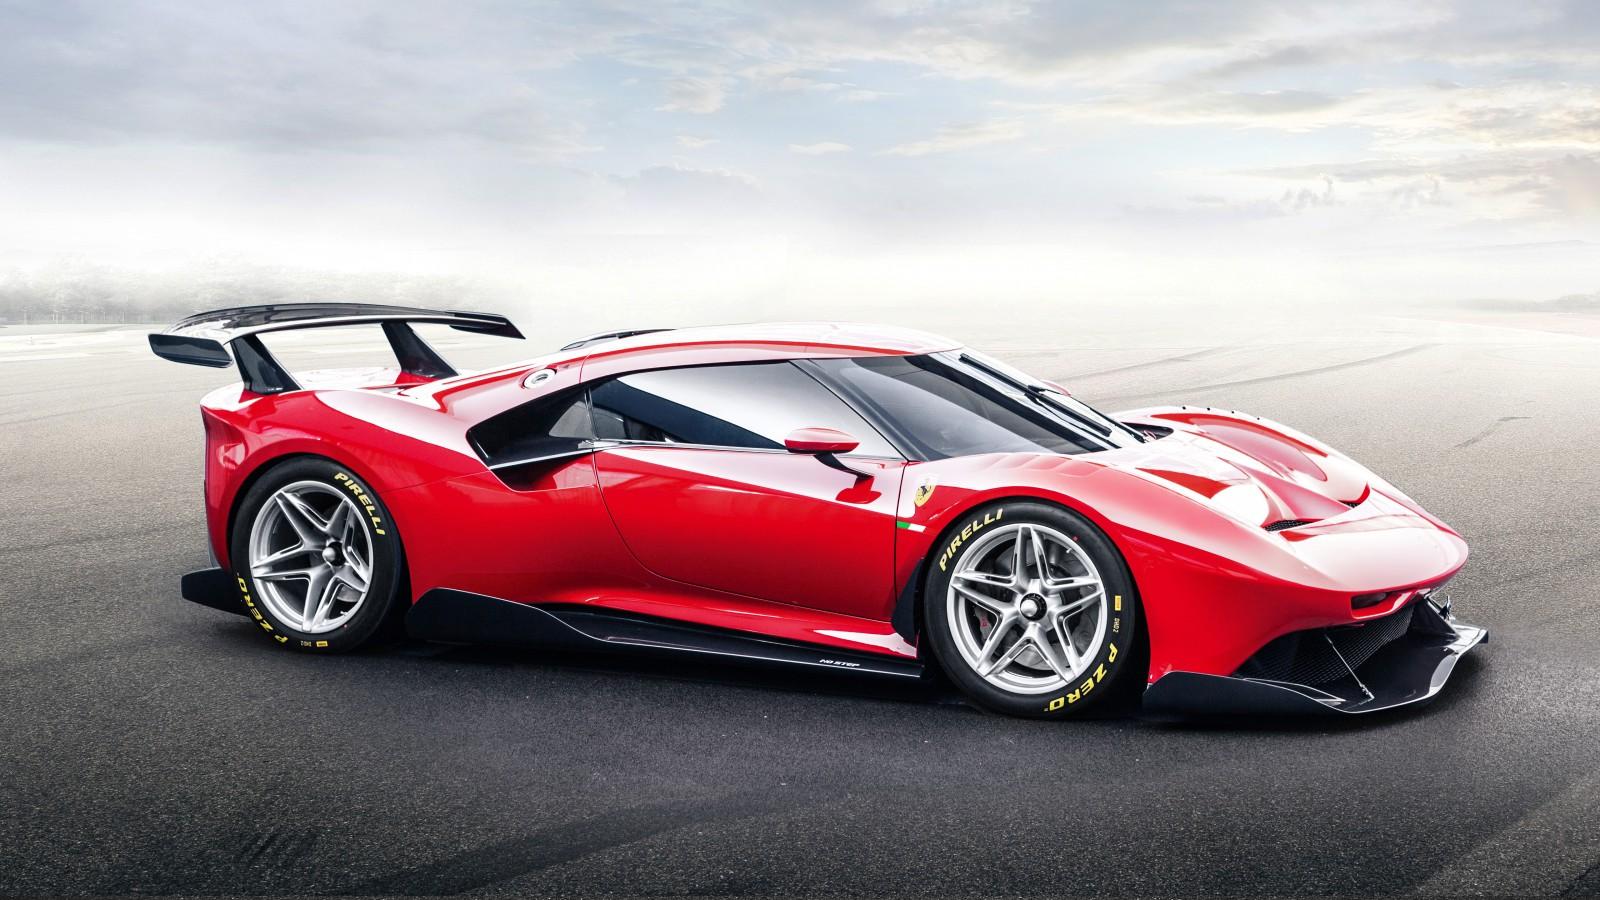 Wallpapers Oakley 3d Ferrari P80c 2019 5k Wallpapers Hd Wallpapers Id 27930